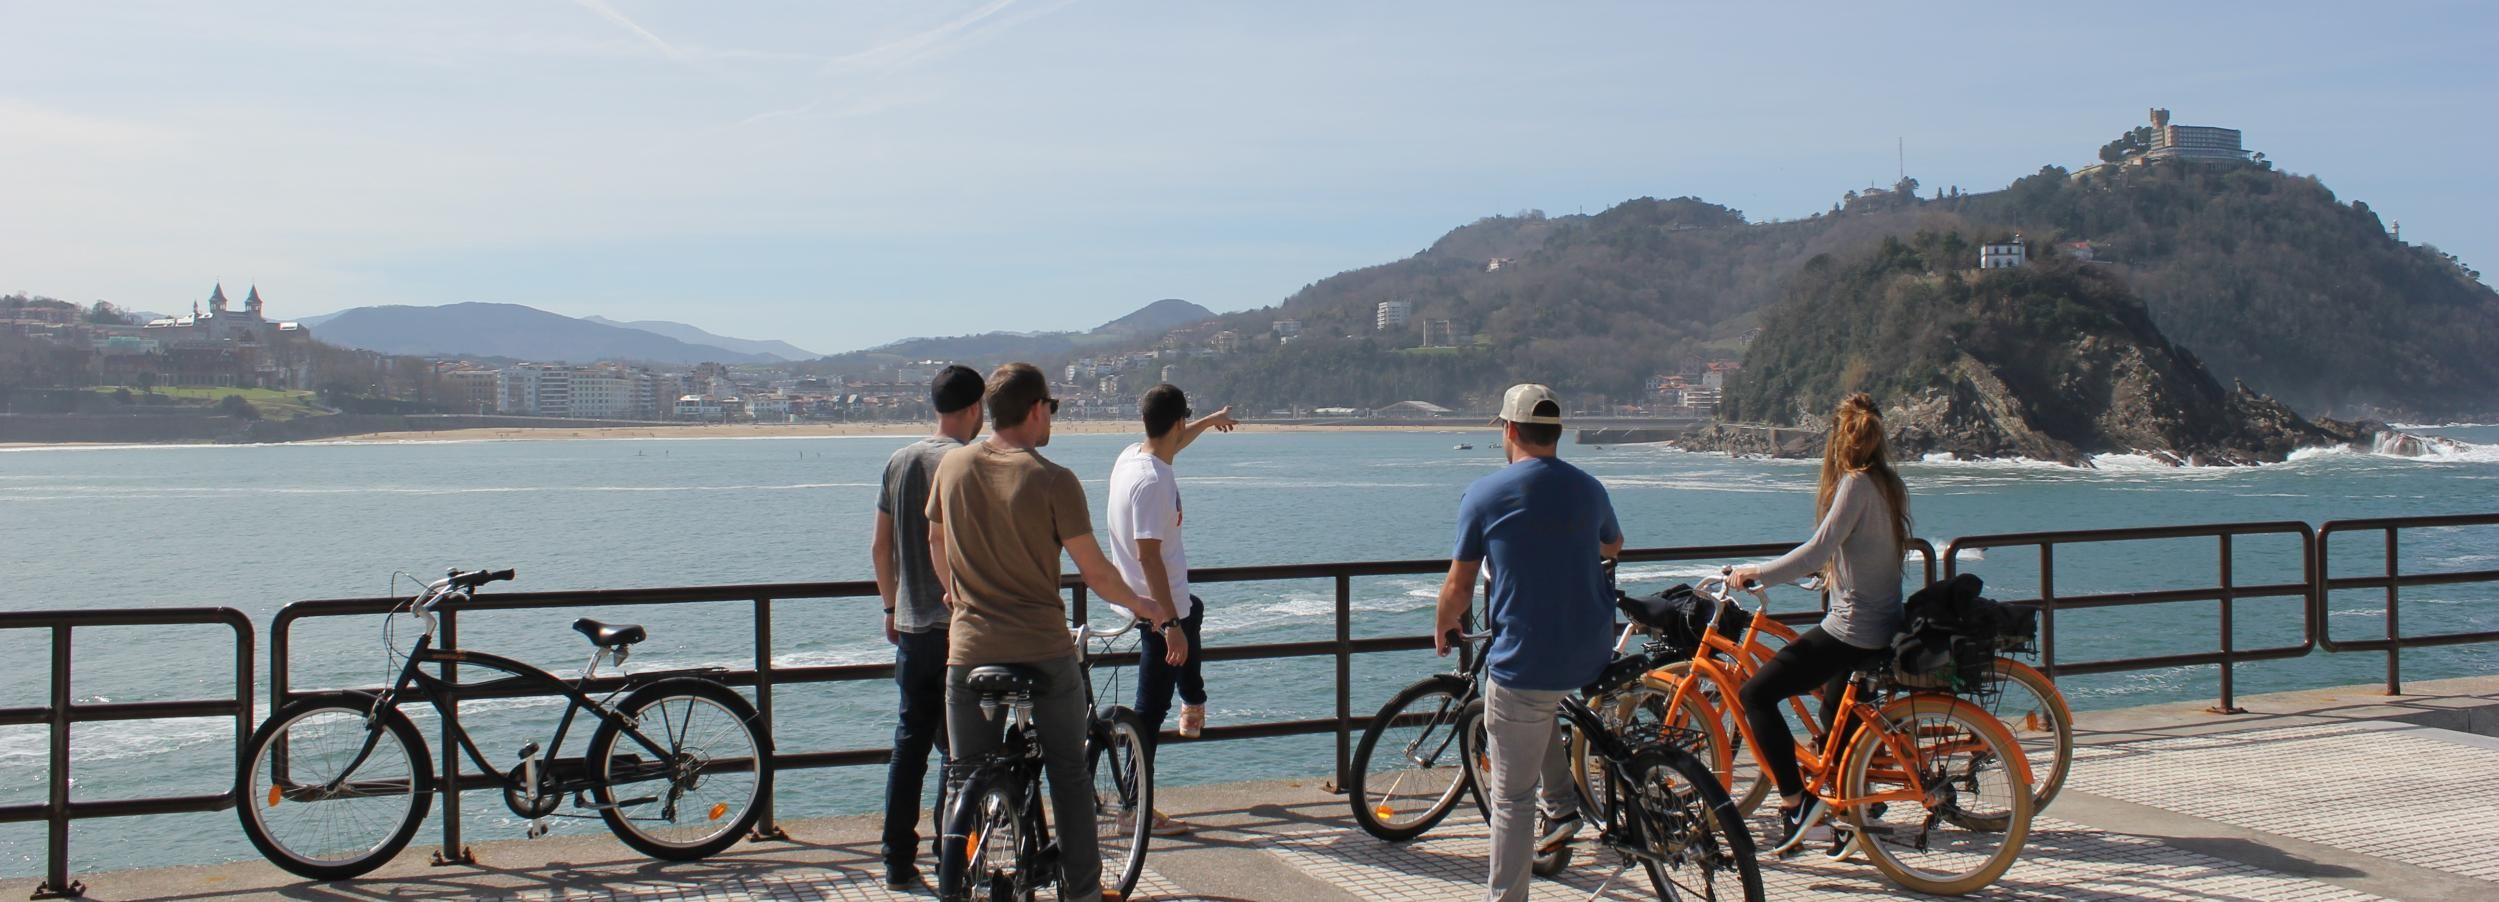 San Sebastián Small Group Bike Tour